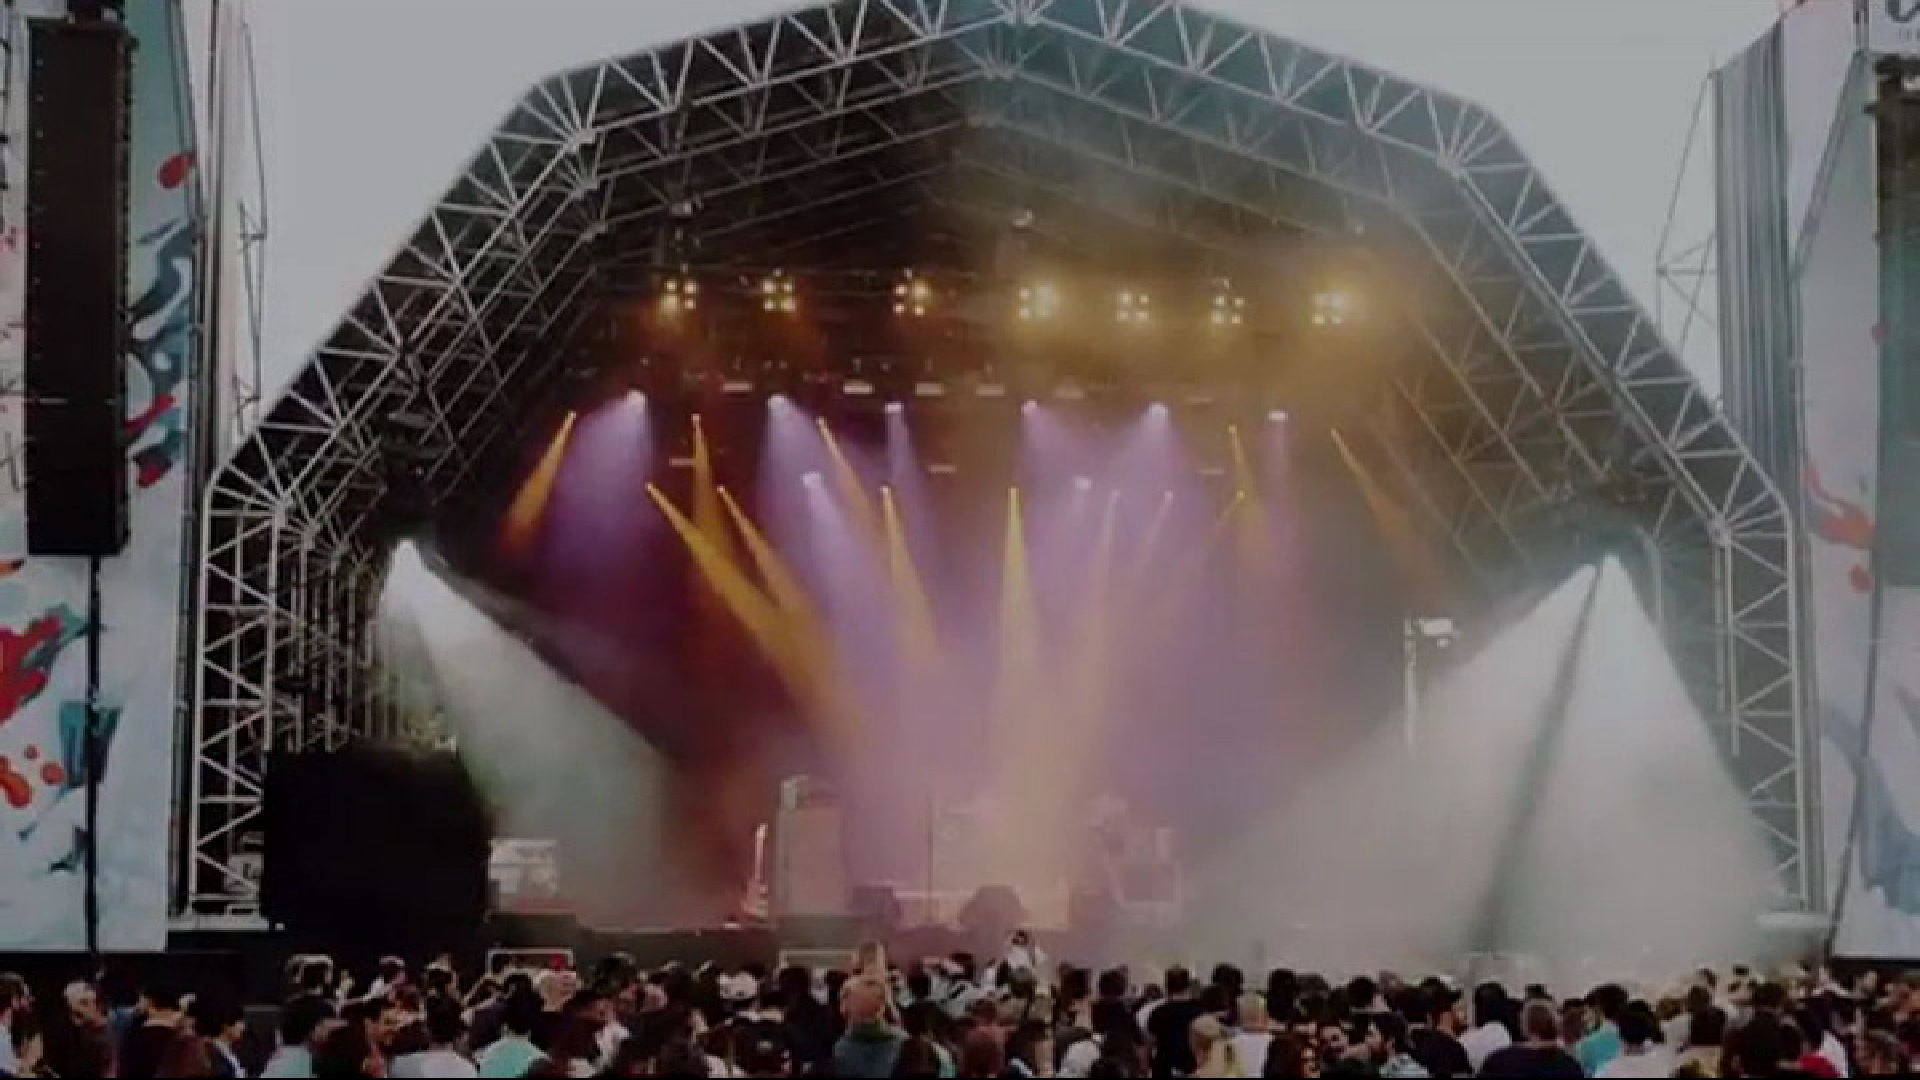 Mallorca+Live+Festival+Festival+2020%3A+24+concerts+i+15000+espectadors